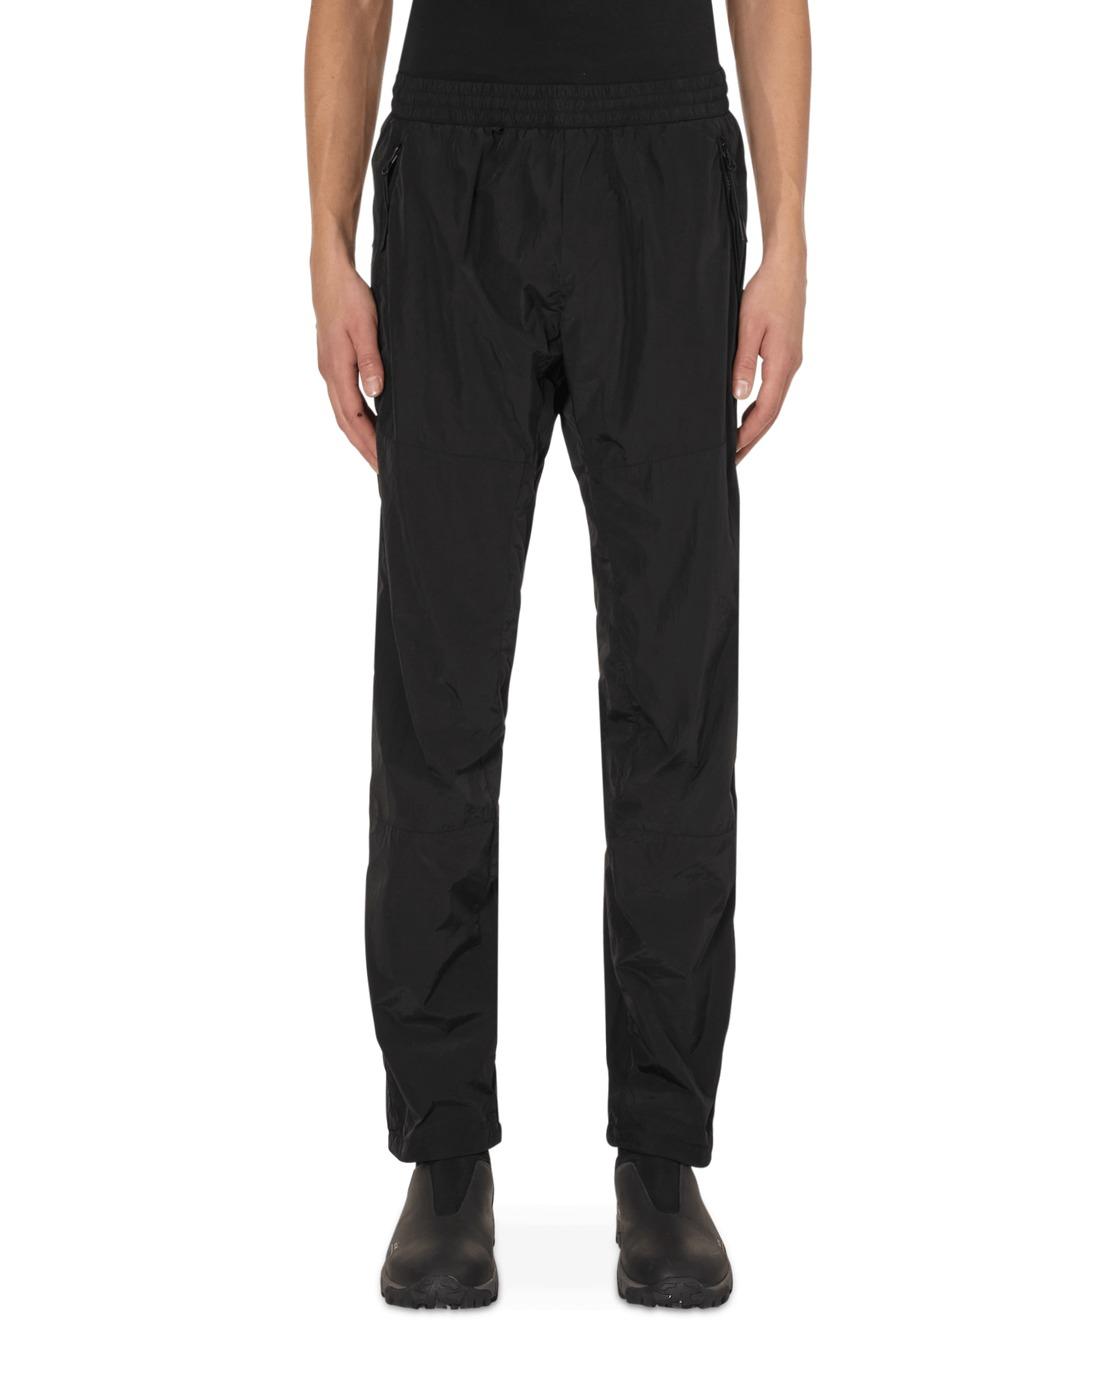 C.P. Company Track Pants Black